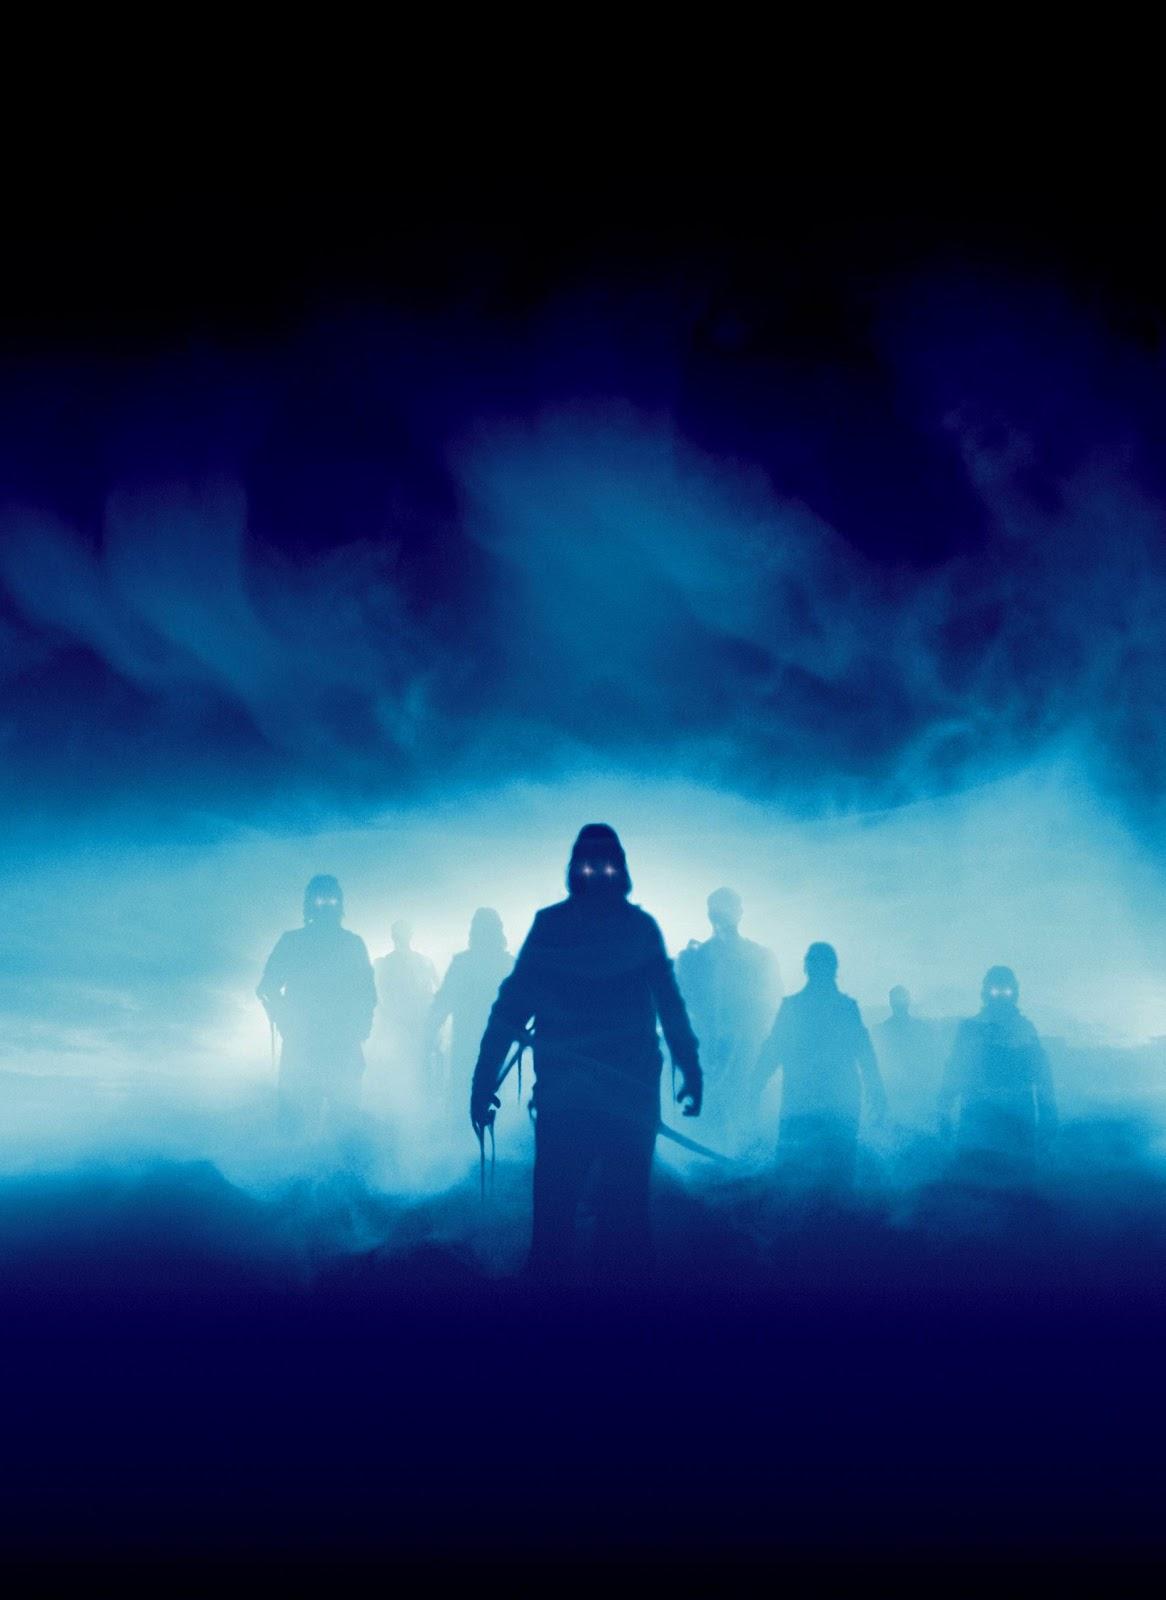 MOVIES MADE ME: MOVIES MADE ME #44: JOHN CARPENTER'S THE FOG